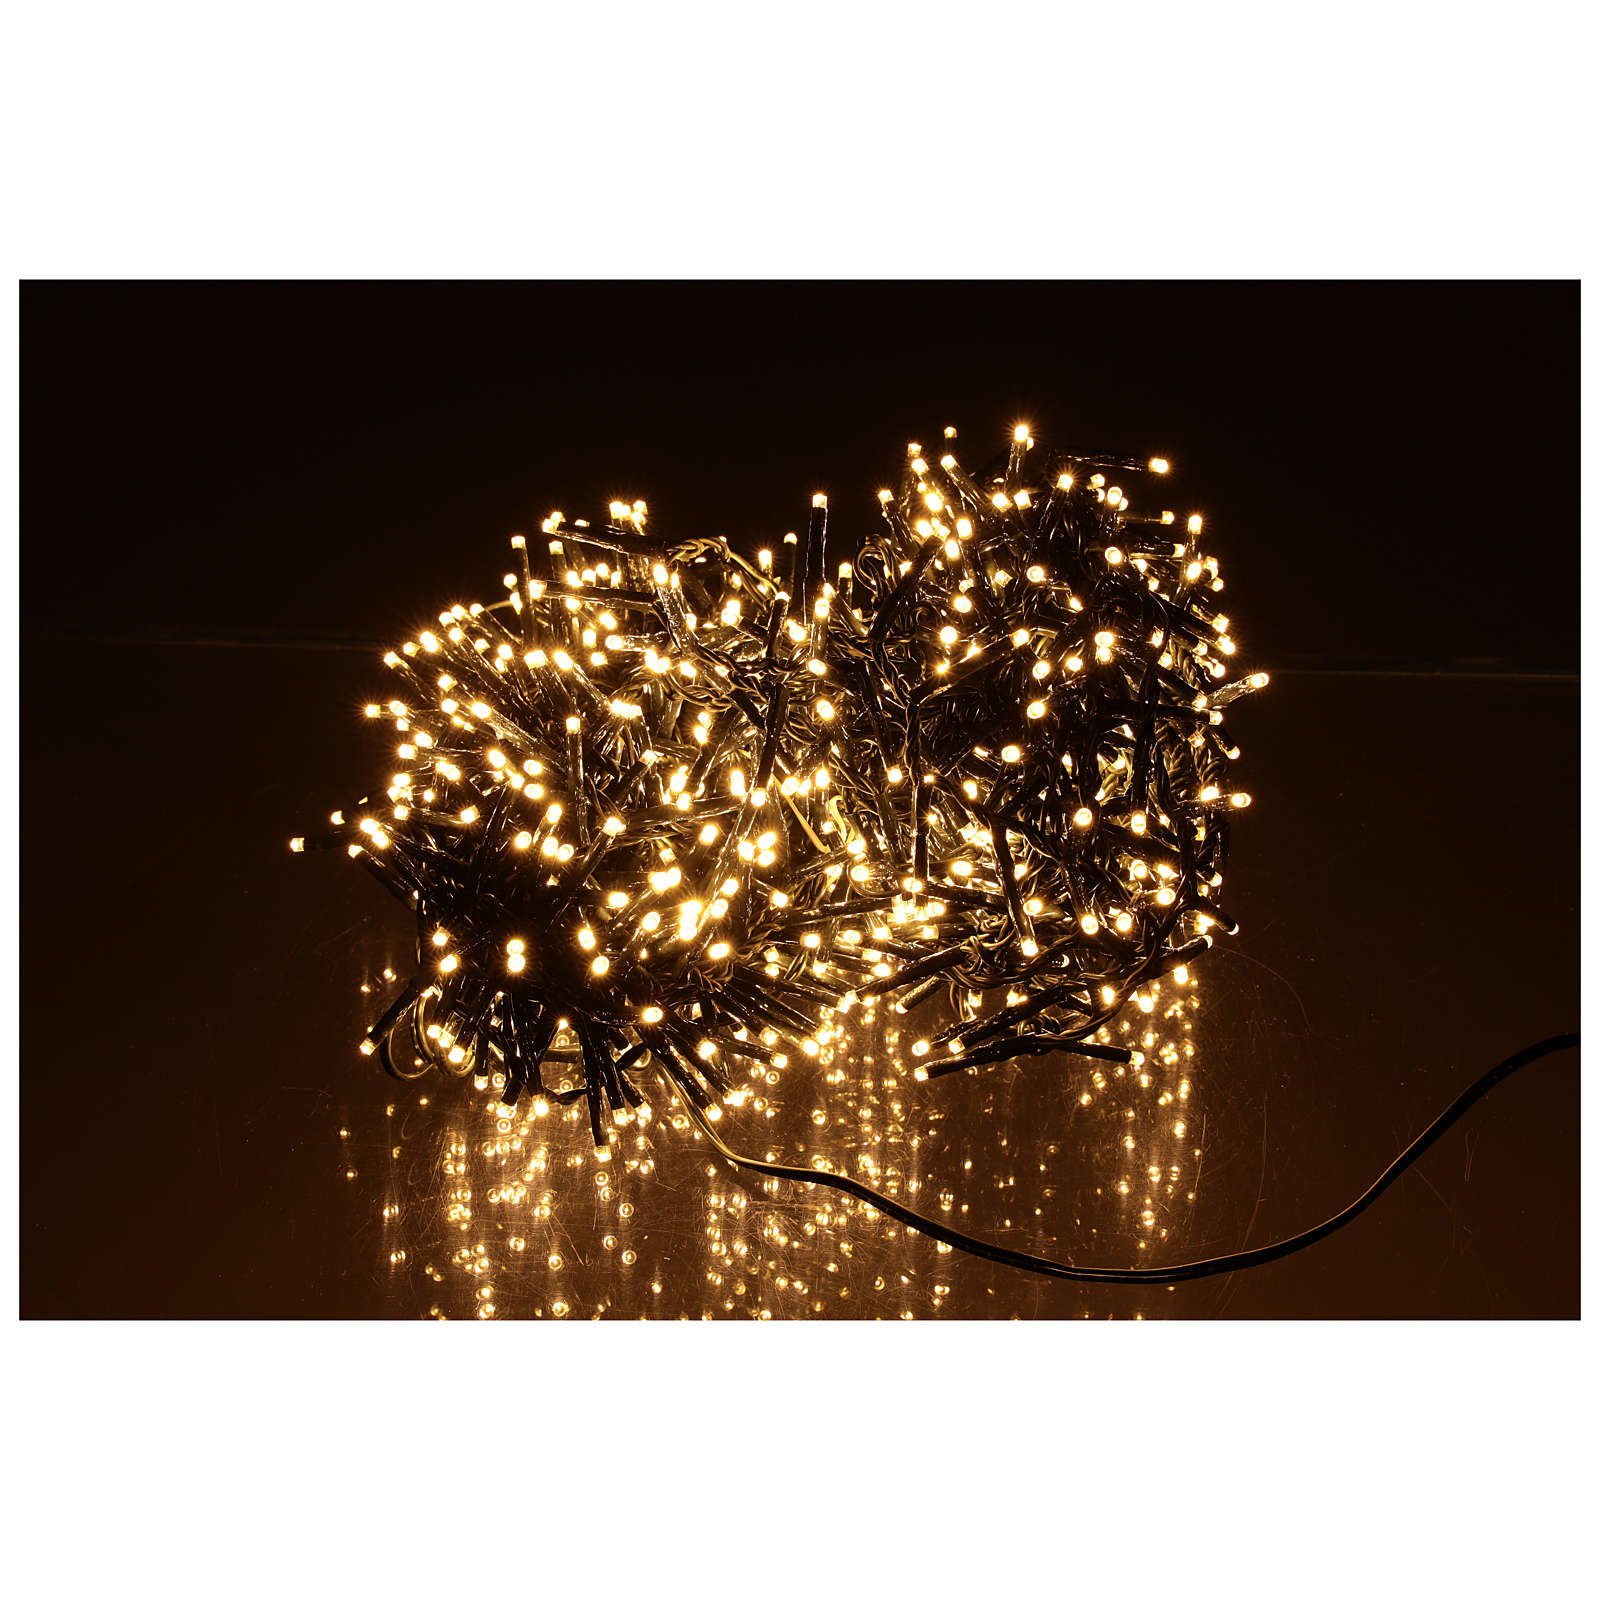 Catena Luminosa Per Foto catena luminosa natalizia verde 750 led bianco caldo 220v esterno